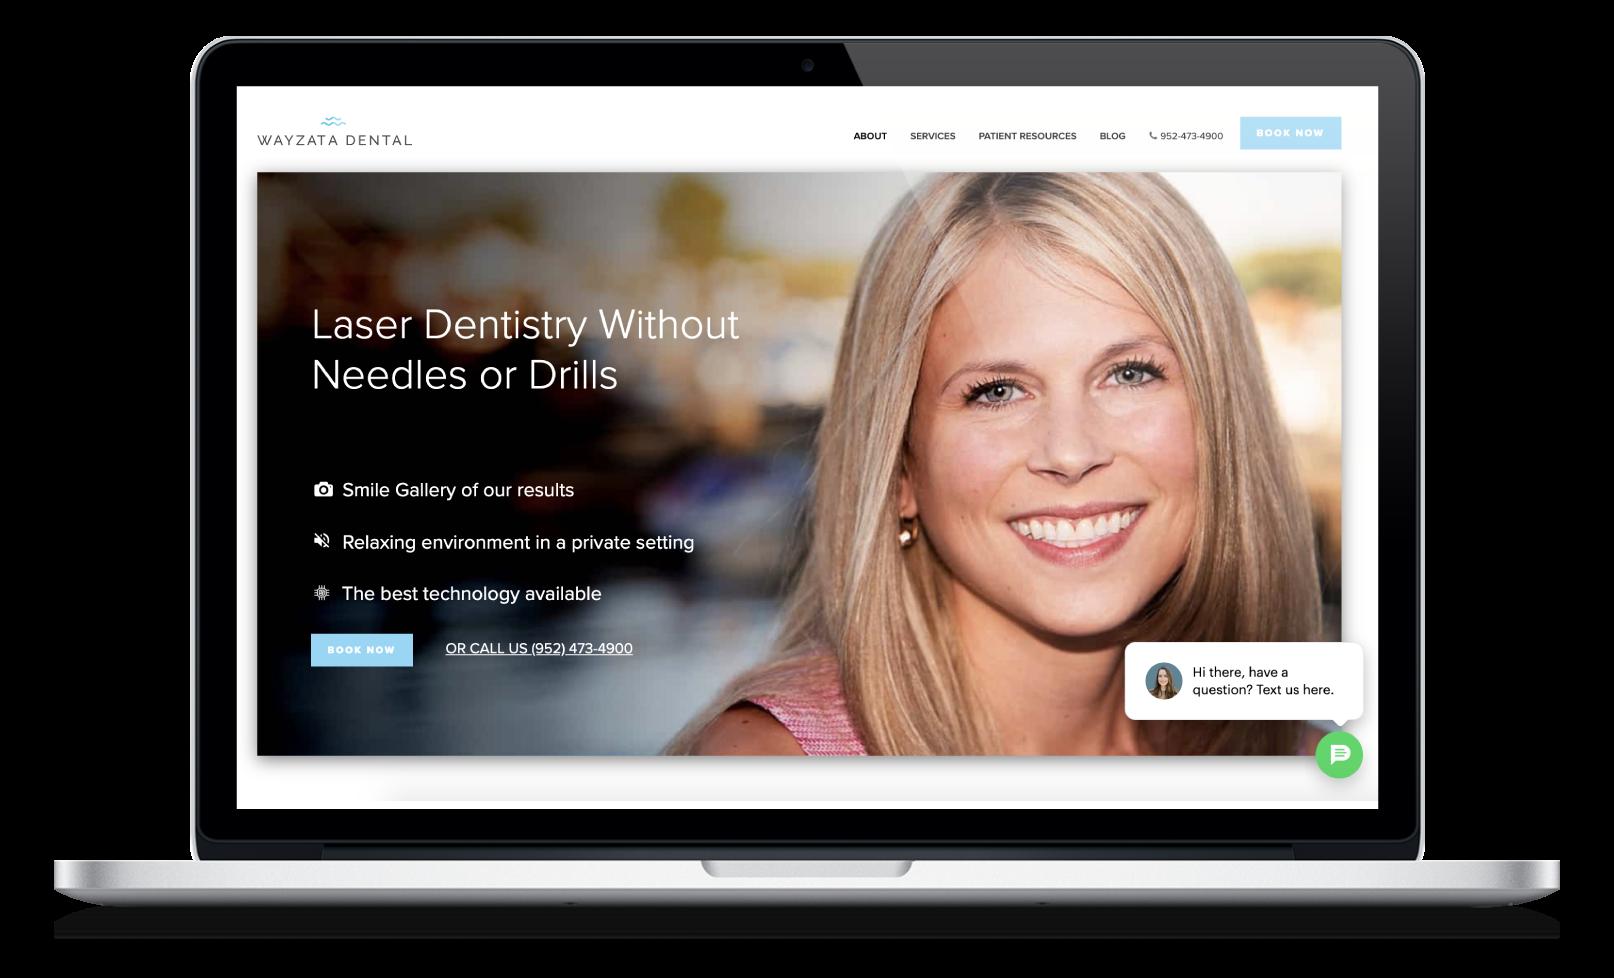 Wayzata Dental Marketing Web Design SEO